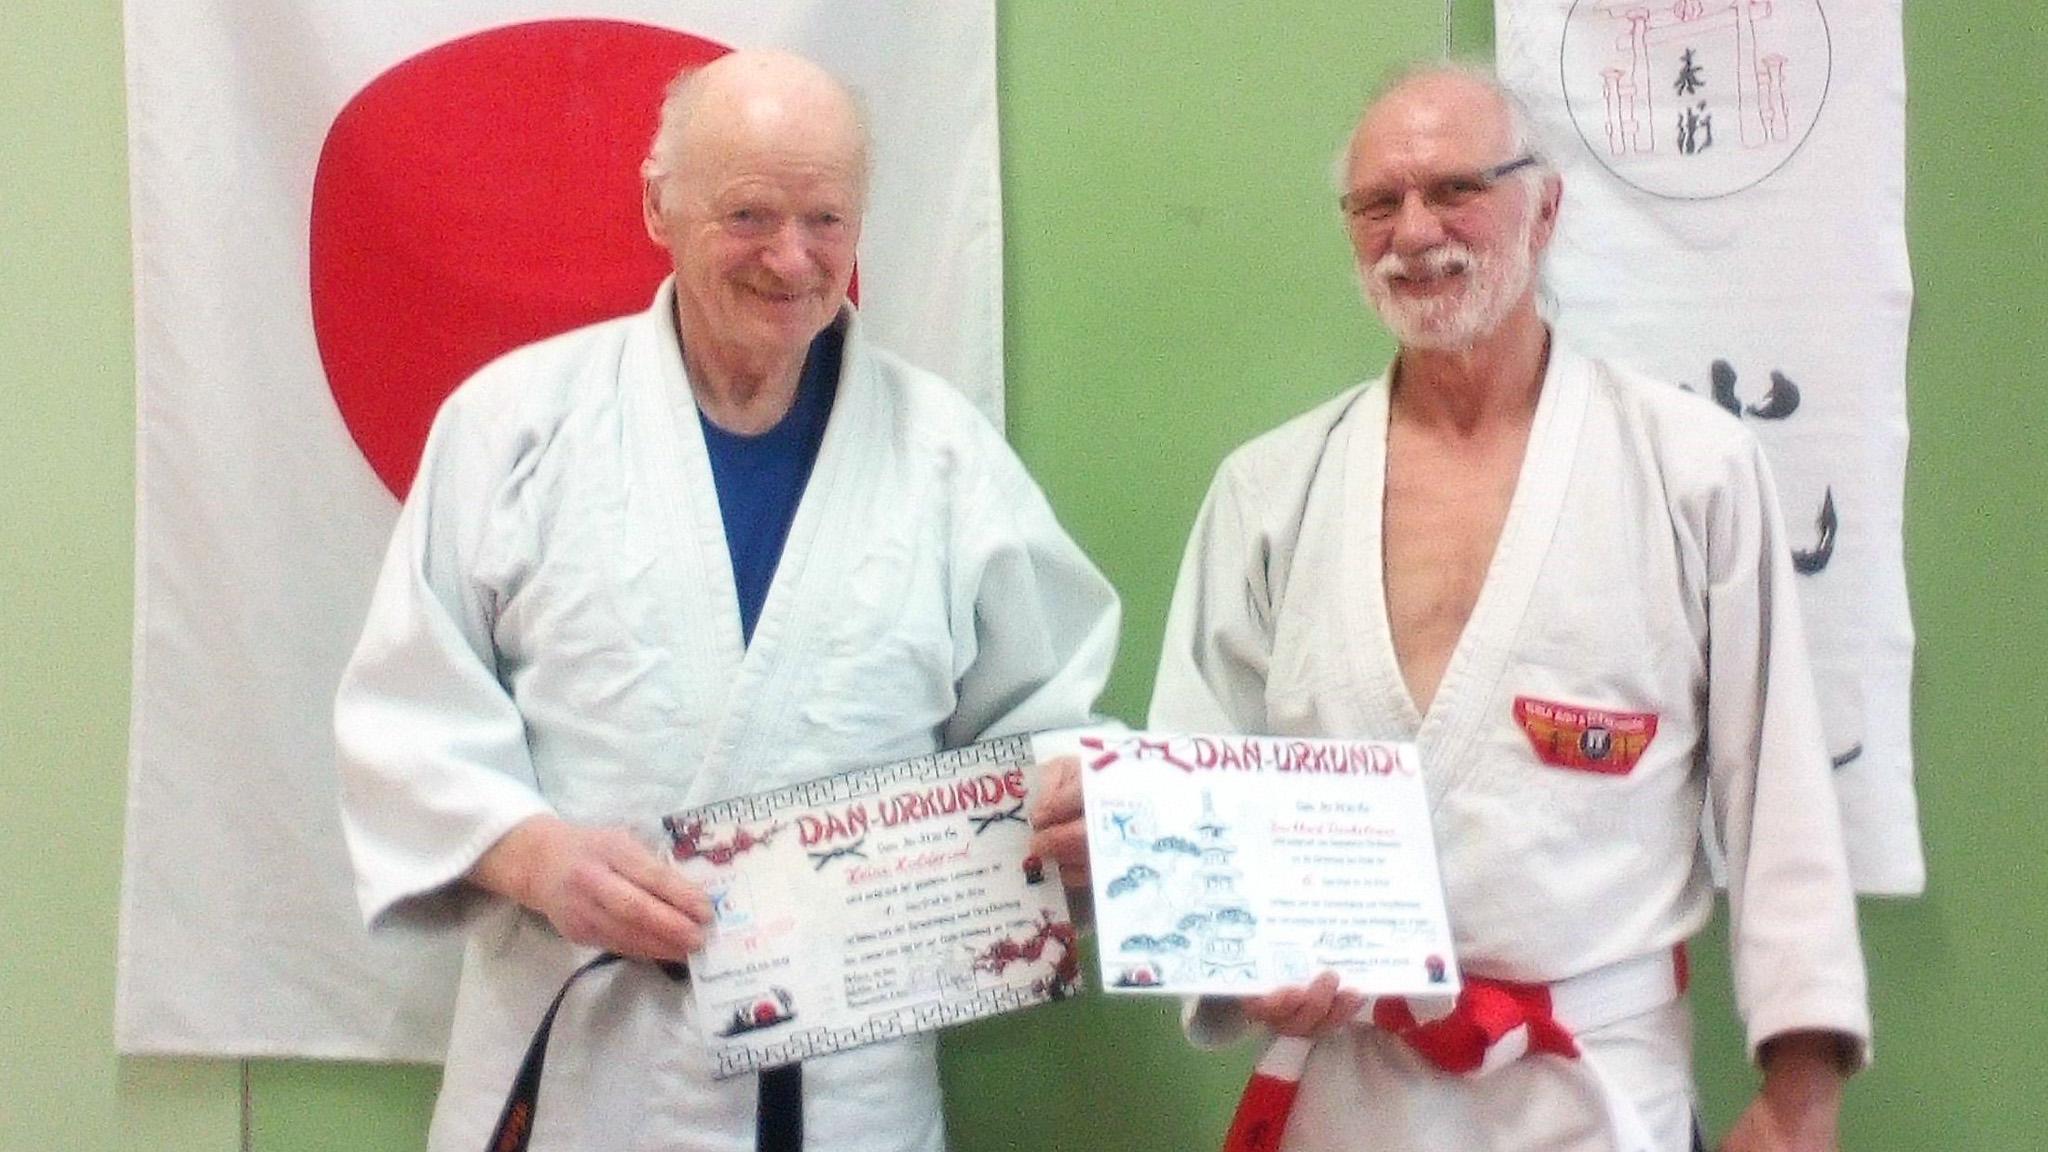 Landeslehrgang Jiu-Jitsu in Trappenkamp